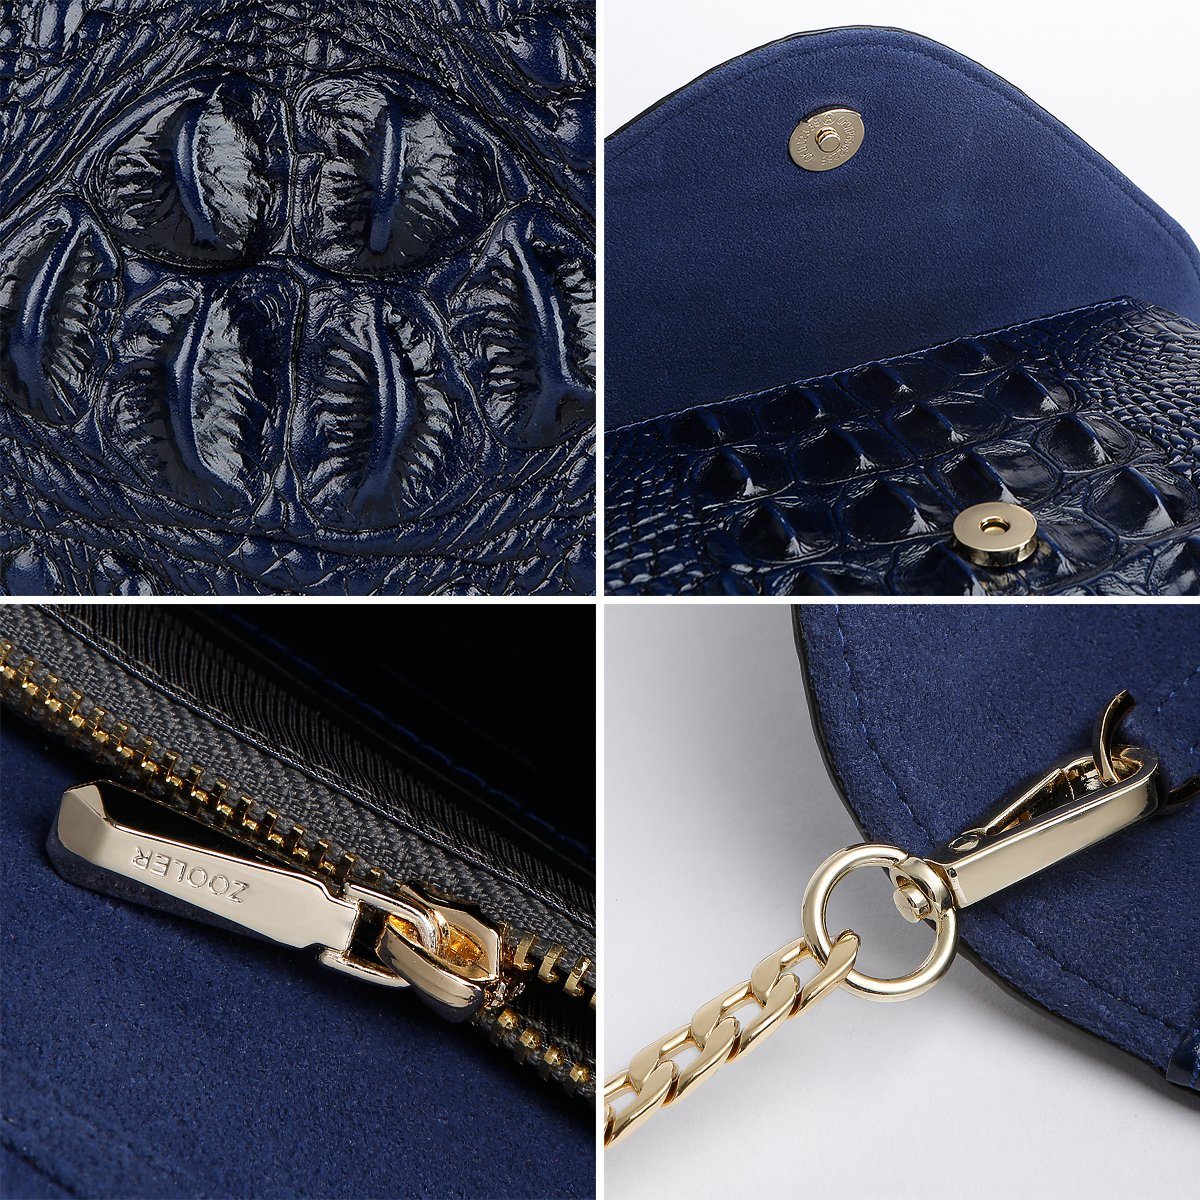 ZOOLER GLOBAL Genuine Leather Purse Clutch Crossbody Bag Crocodile Embrossed Blue